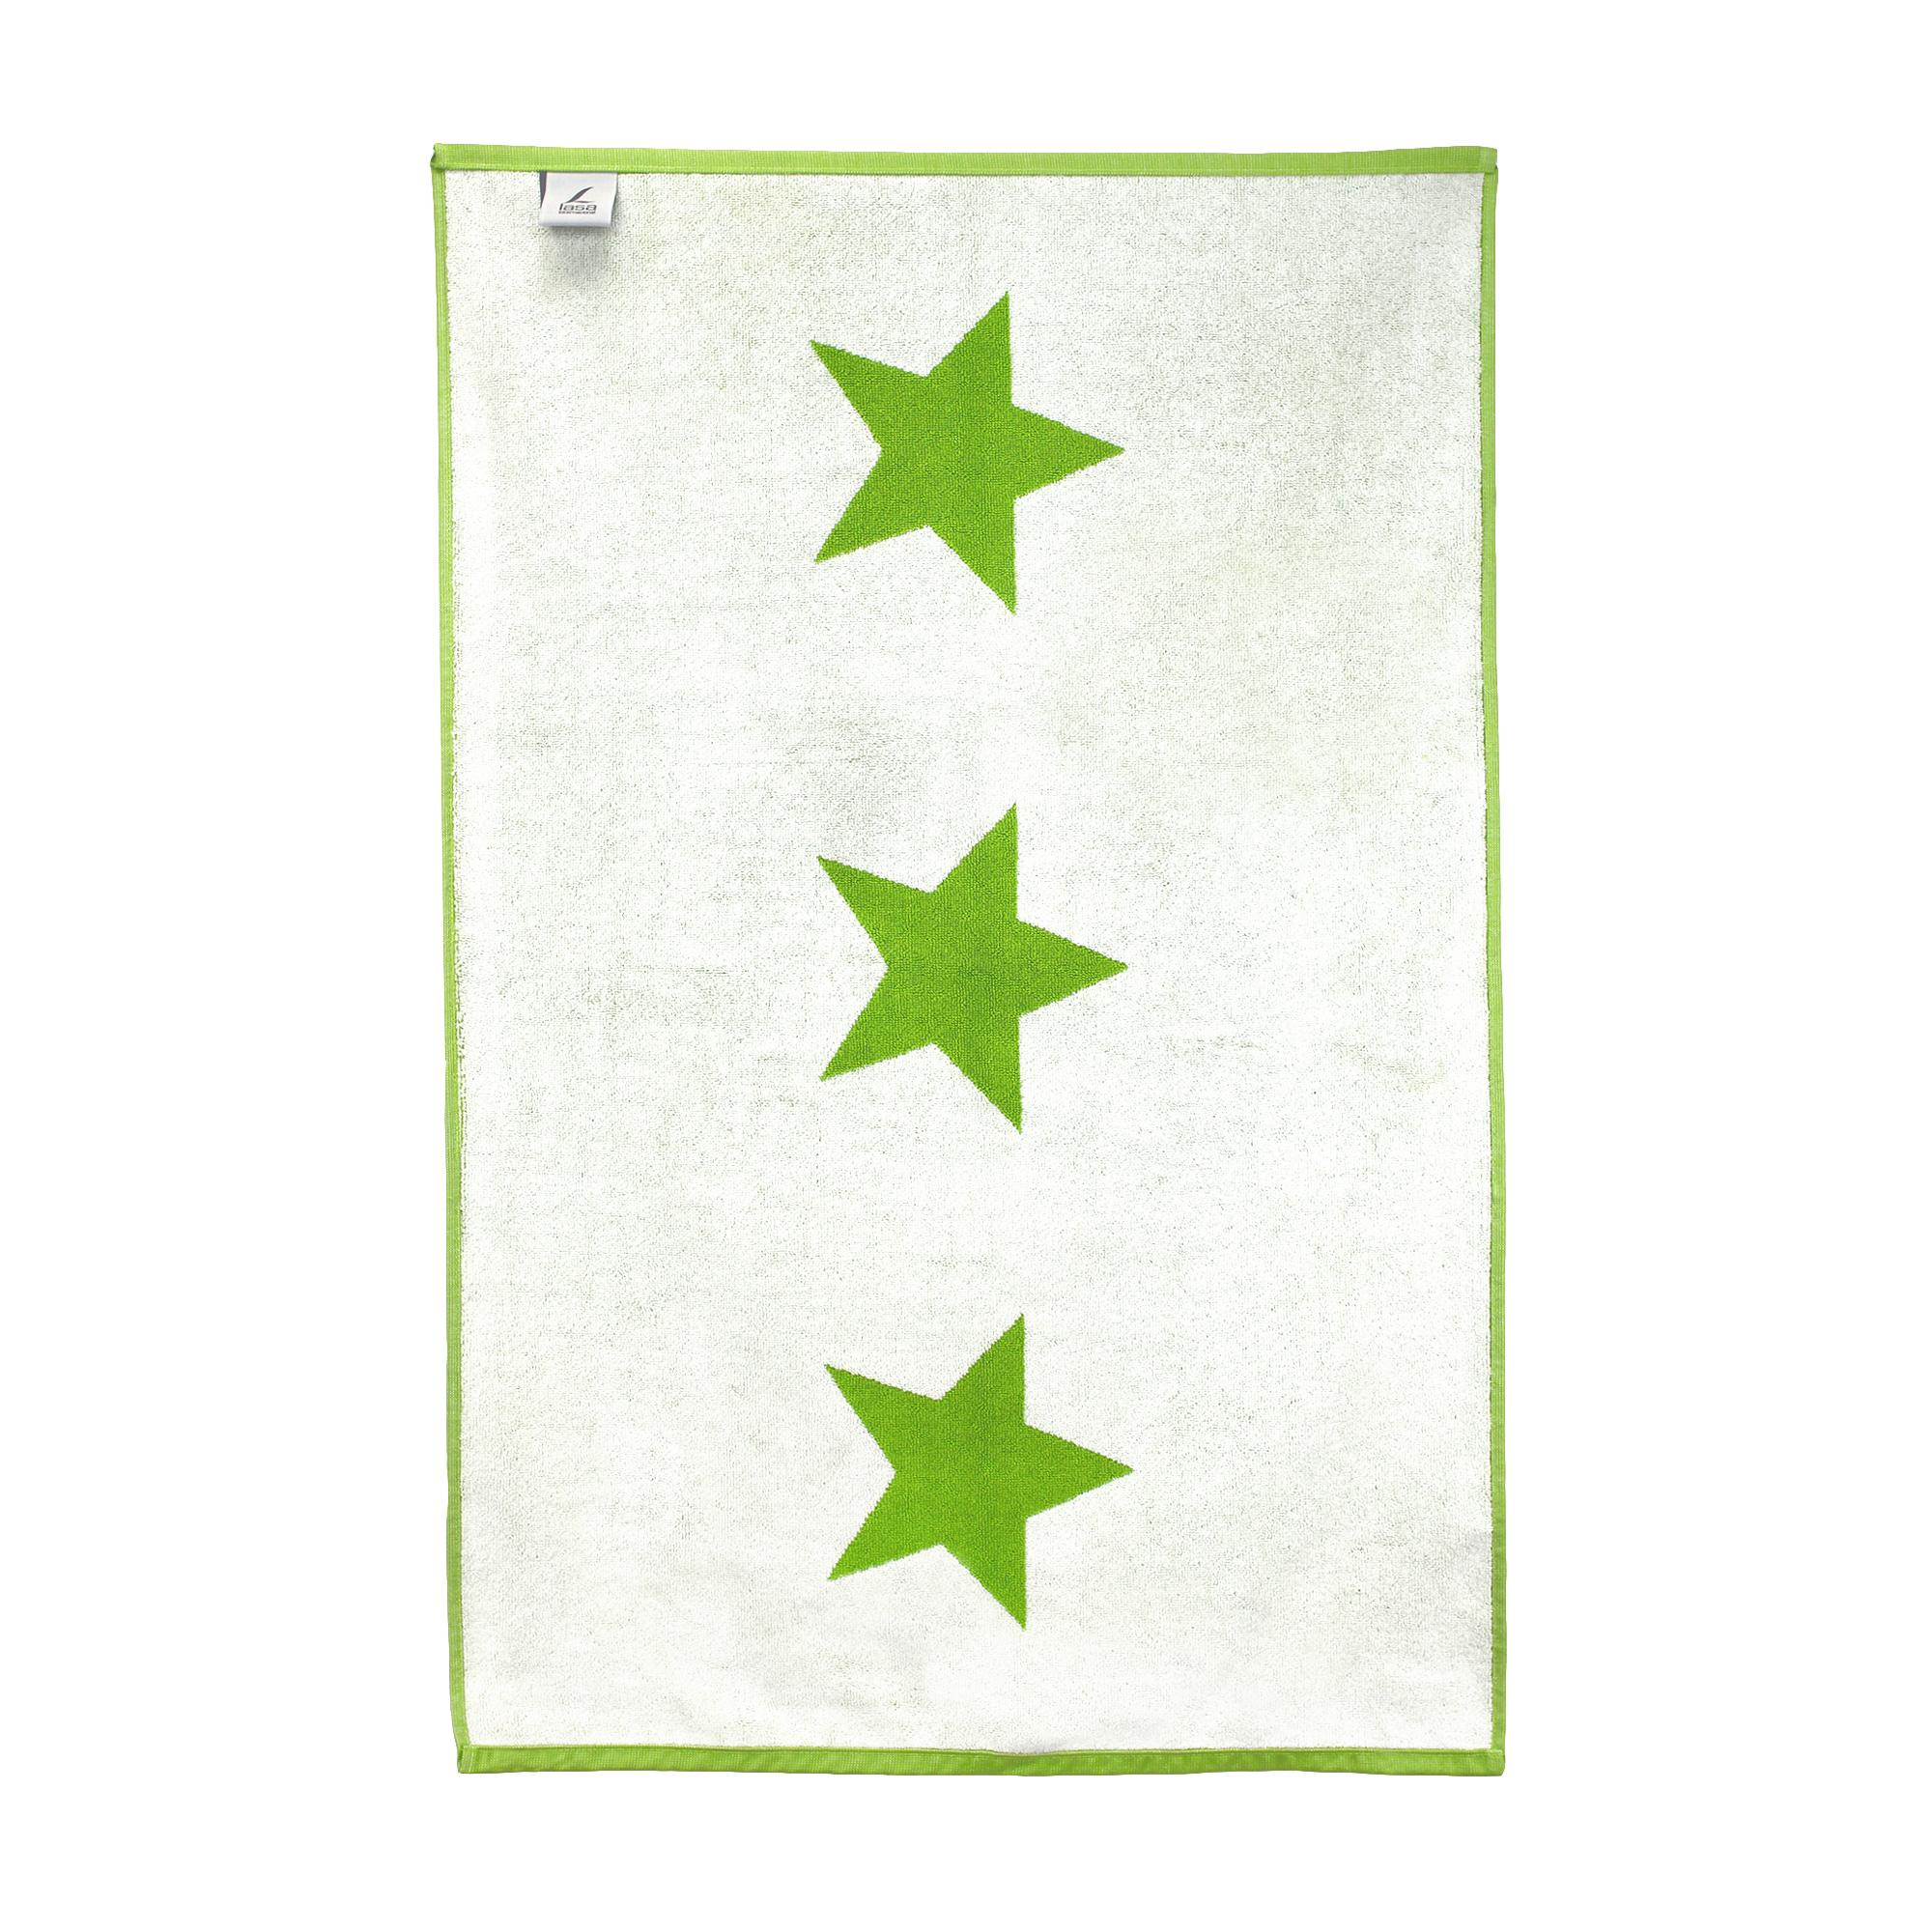 Tapis De Bain 60x90 Cm 100 Coton 700 G M2 Stars Vert Ebay